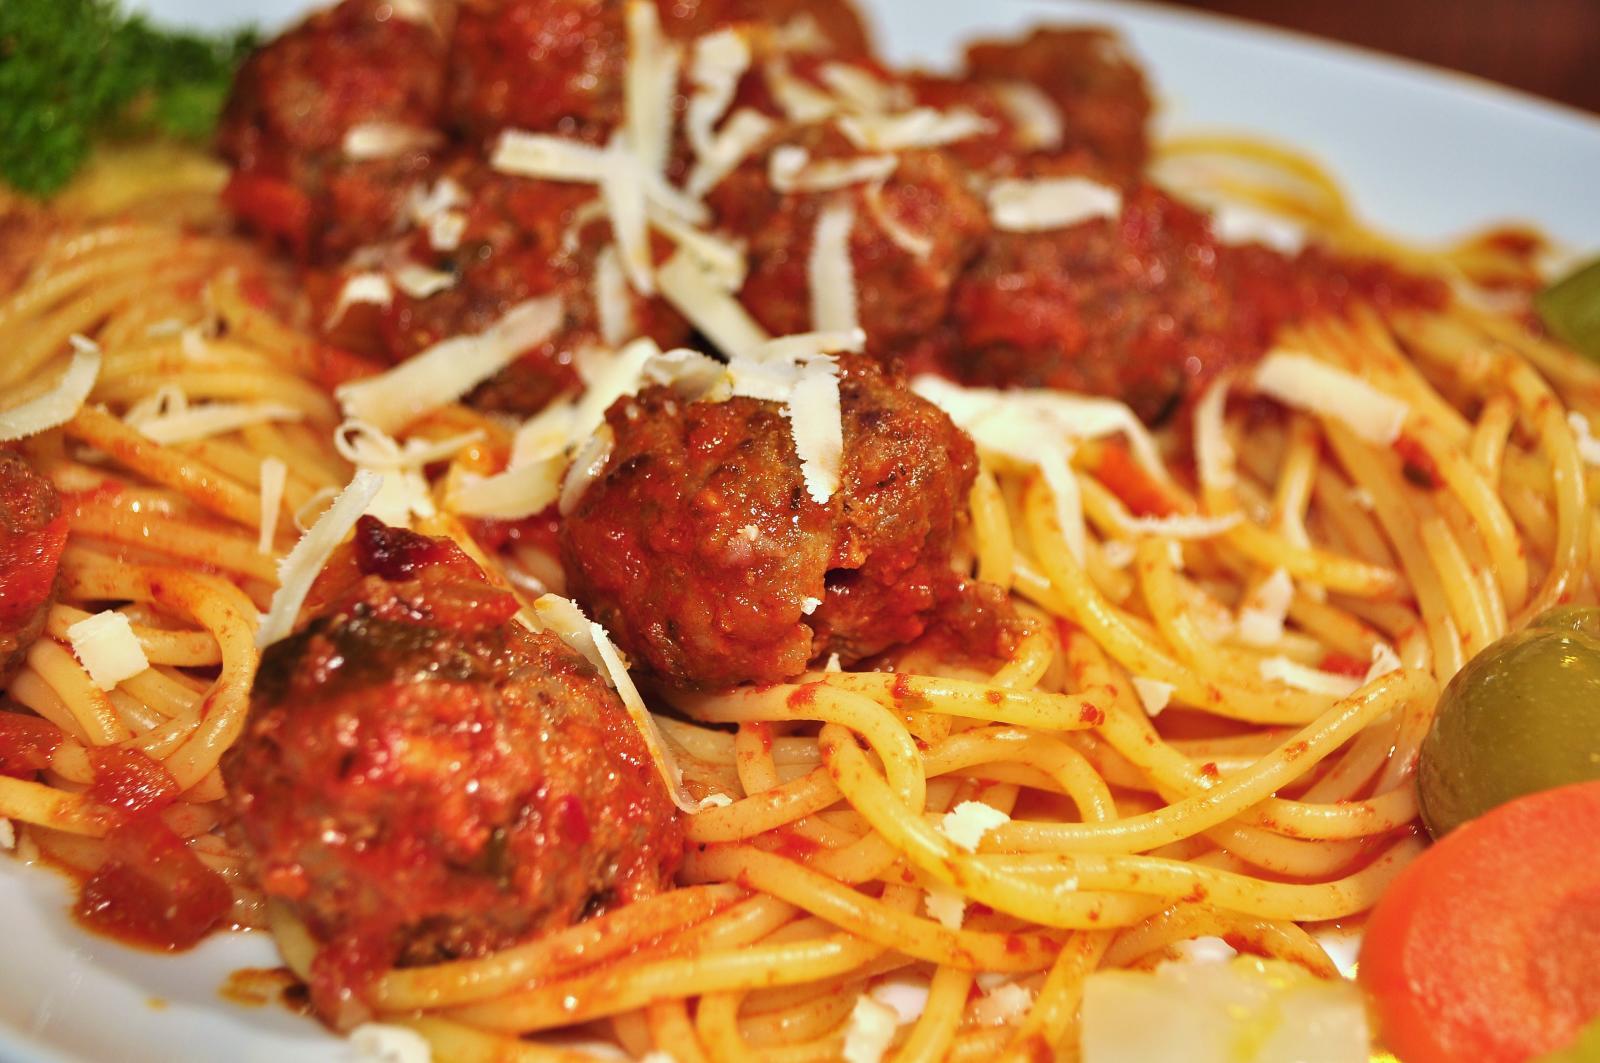 Yummy Plate of Spaghetti